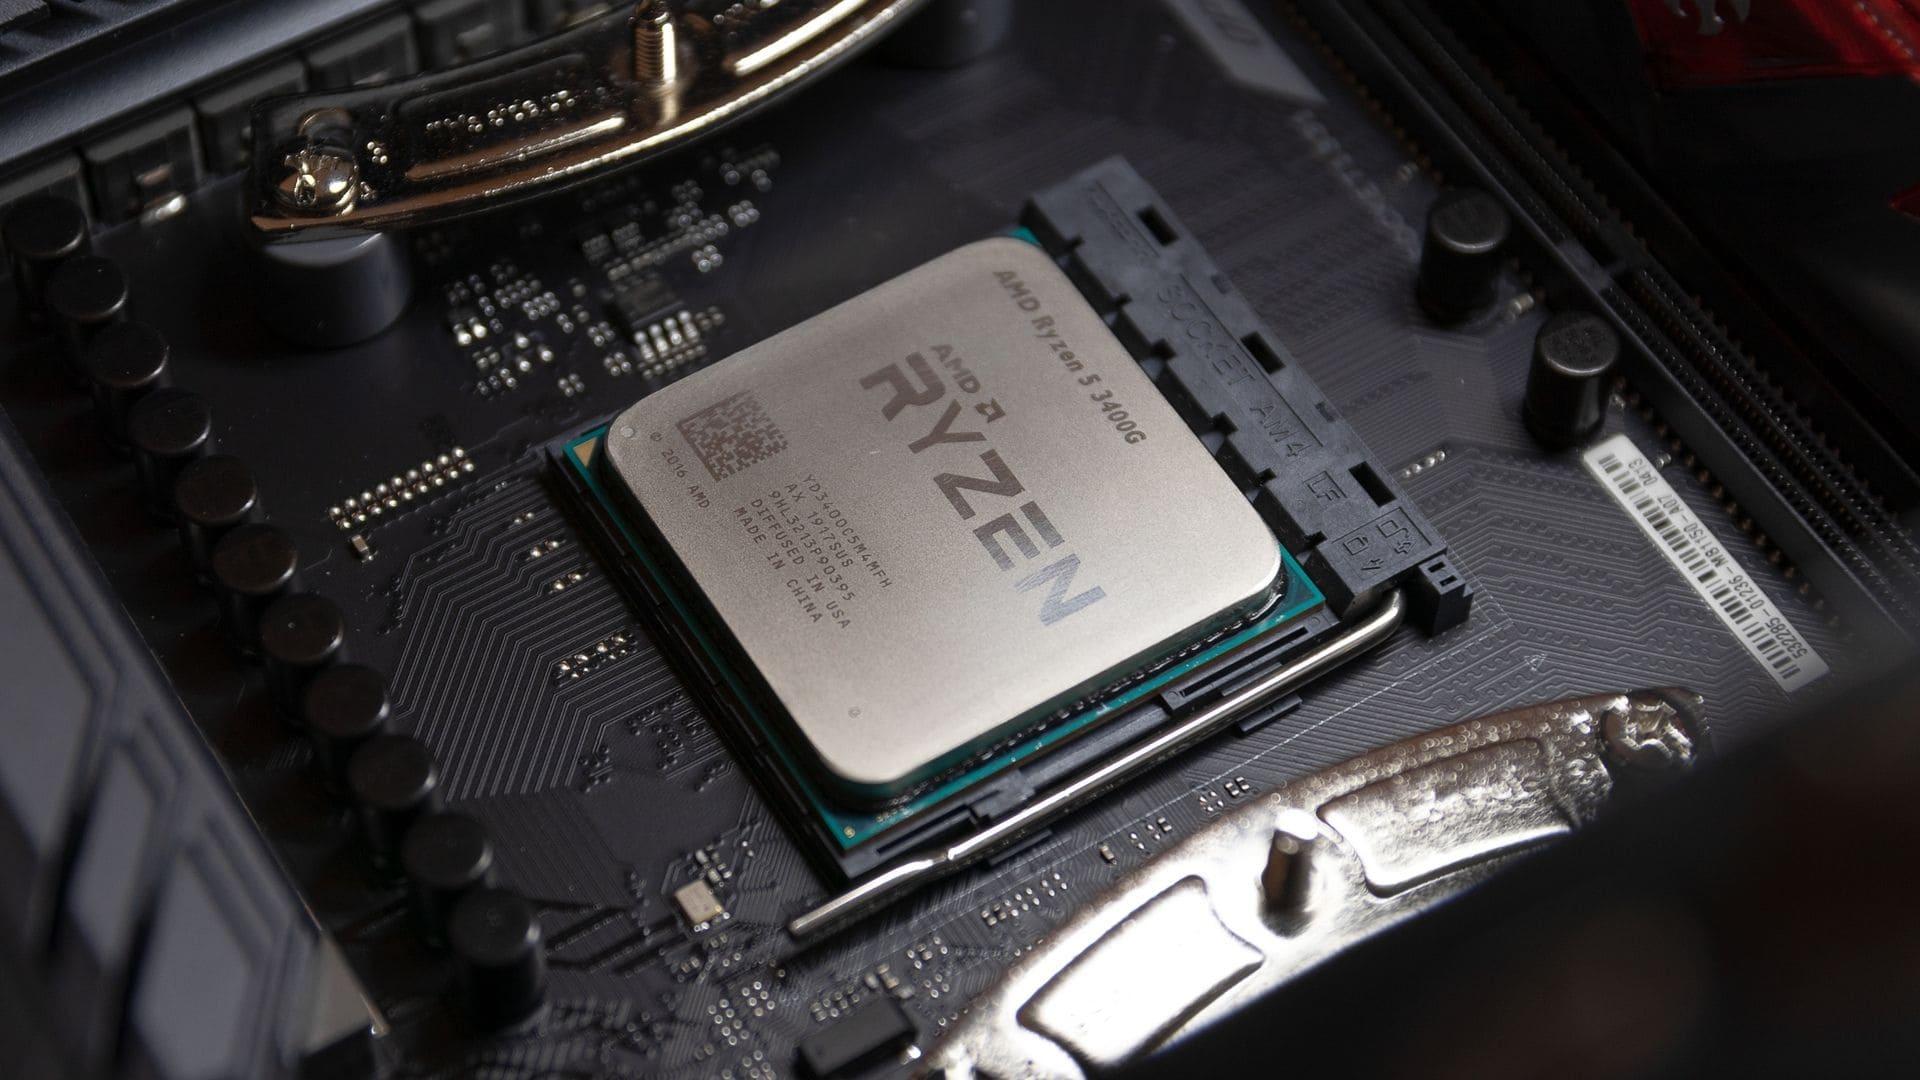 Processador AMD Ryzen 5 3400G no computador